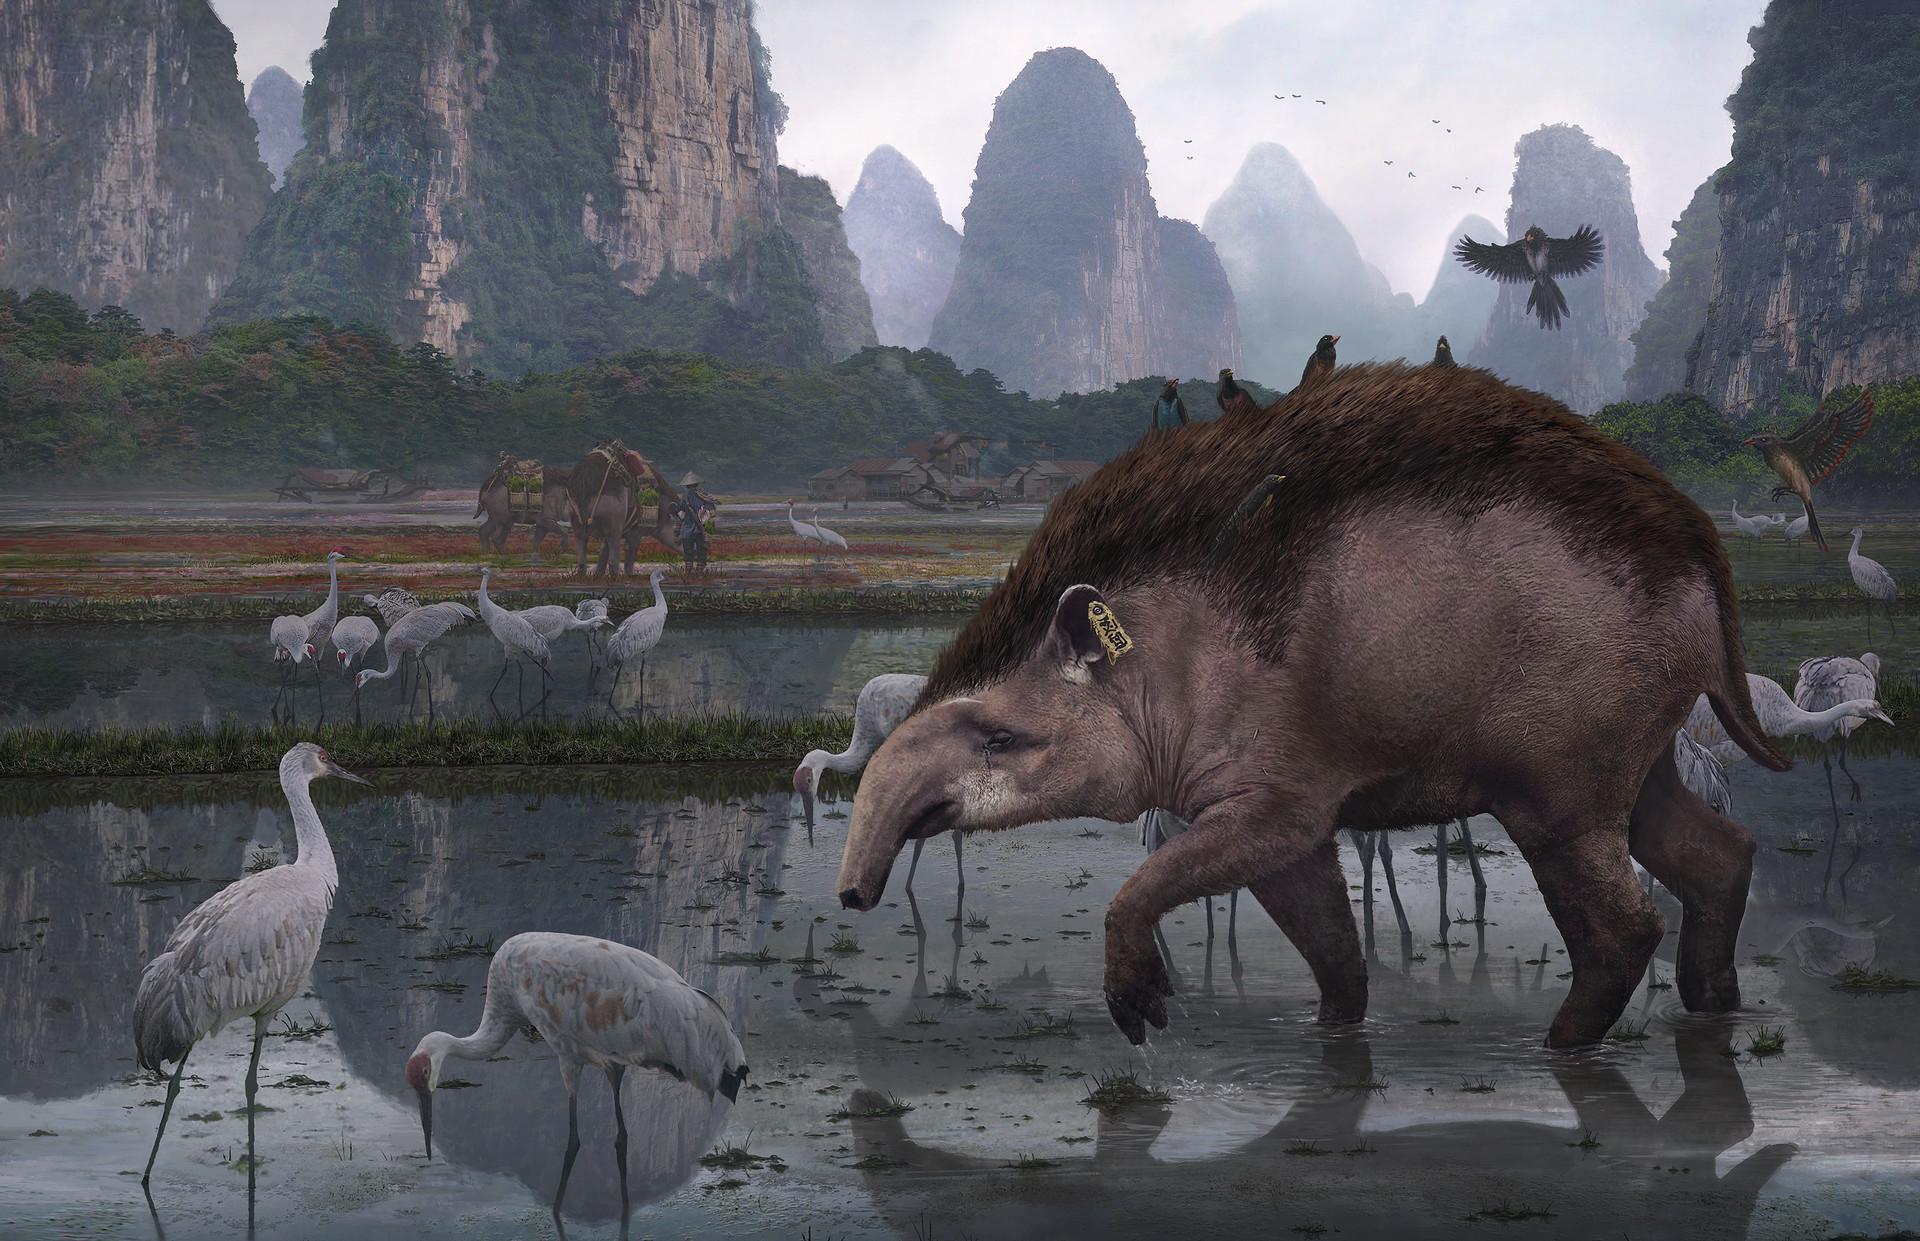 Jordi van hees 2 solo wild tapir render v40 final small